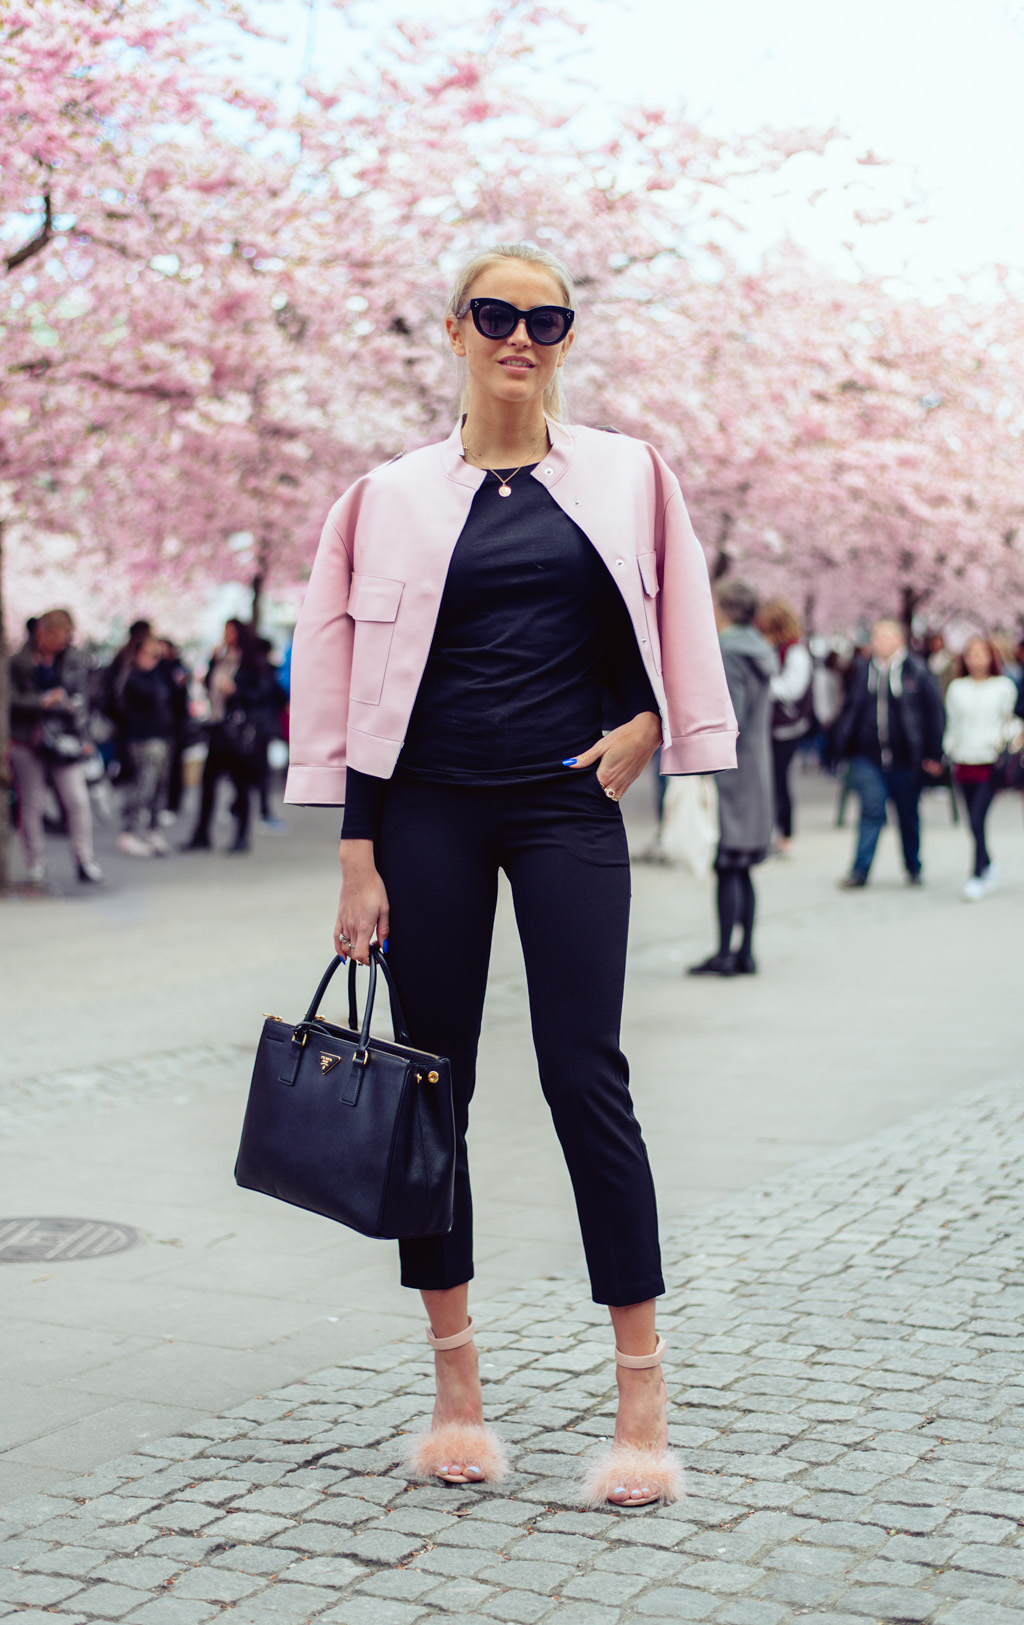 janni-deler-pink-flowersDSC_5746